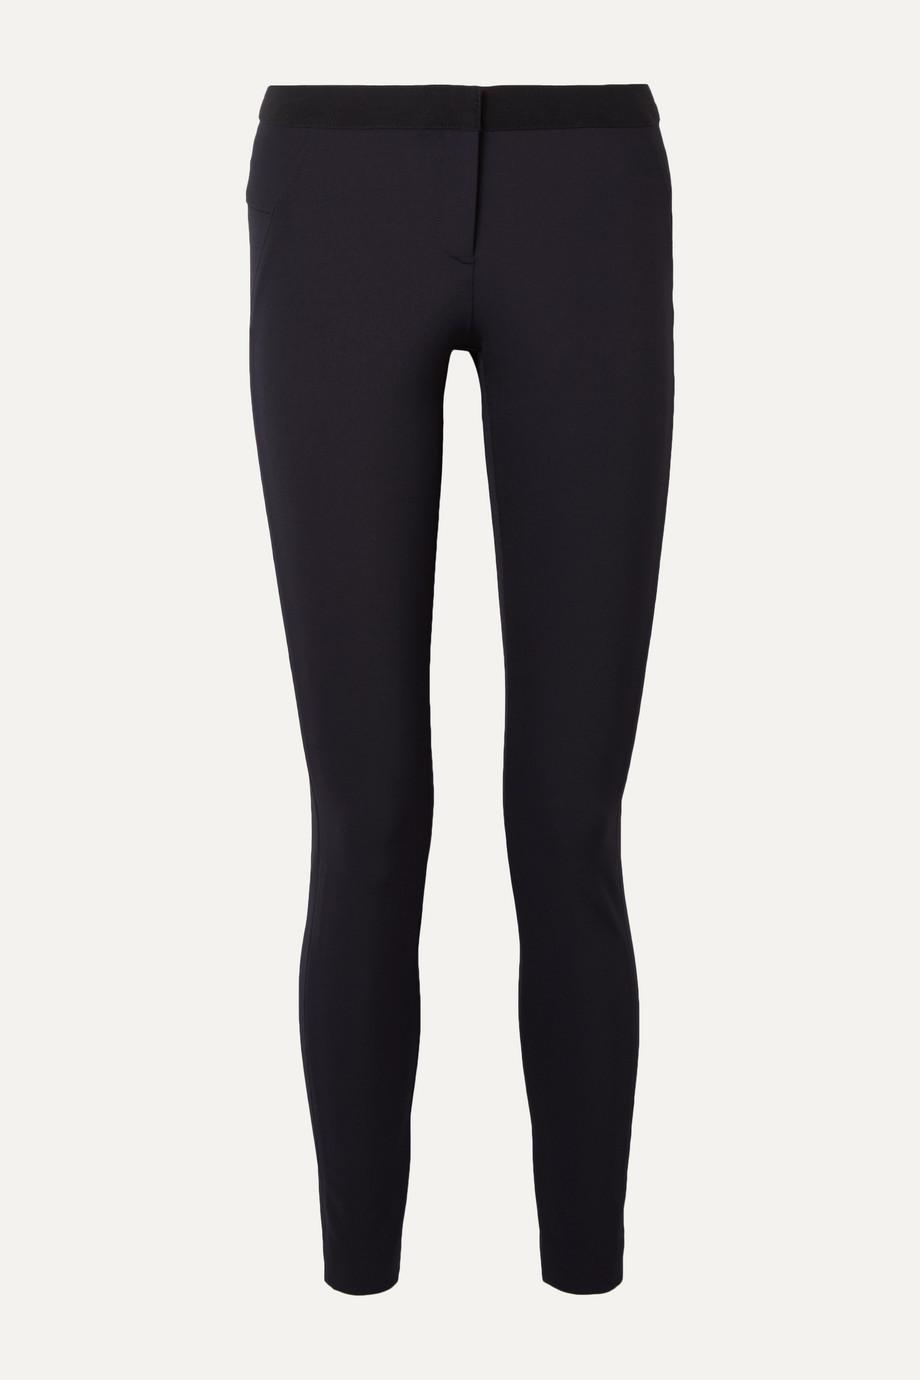 Veronica Beard Stretch-crepe slim-leg pants